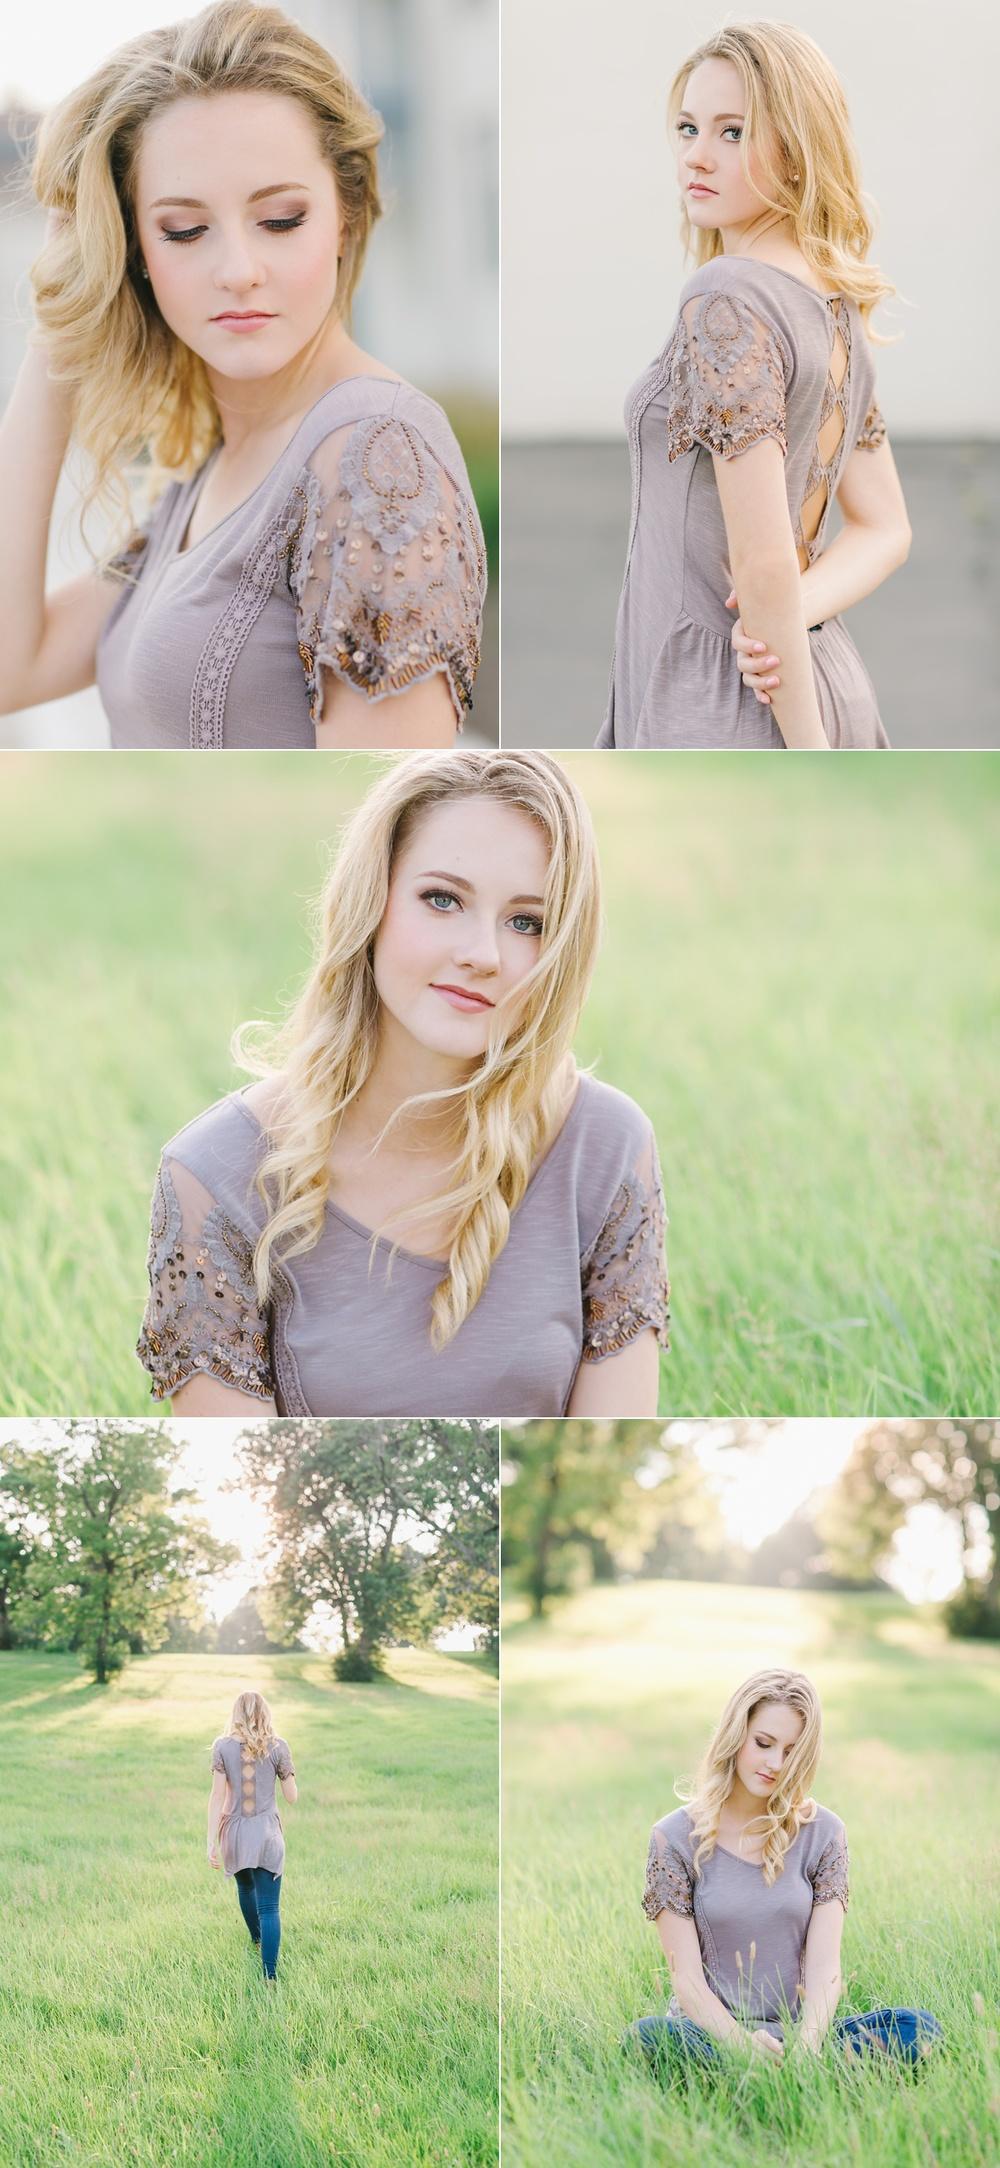 Lux-Senior-Photography-Dayton-Ohio-04.jpg